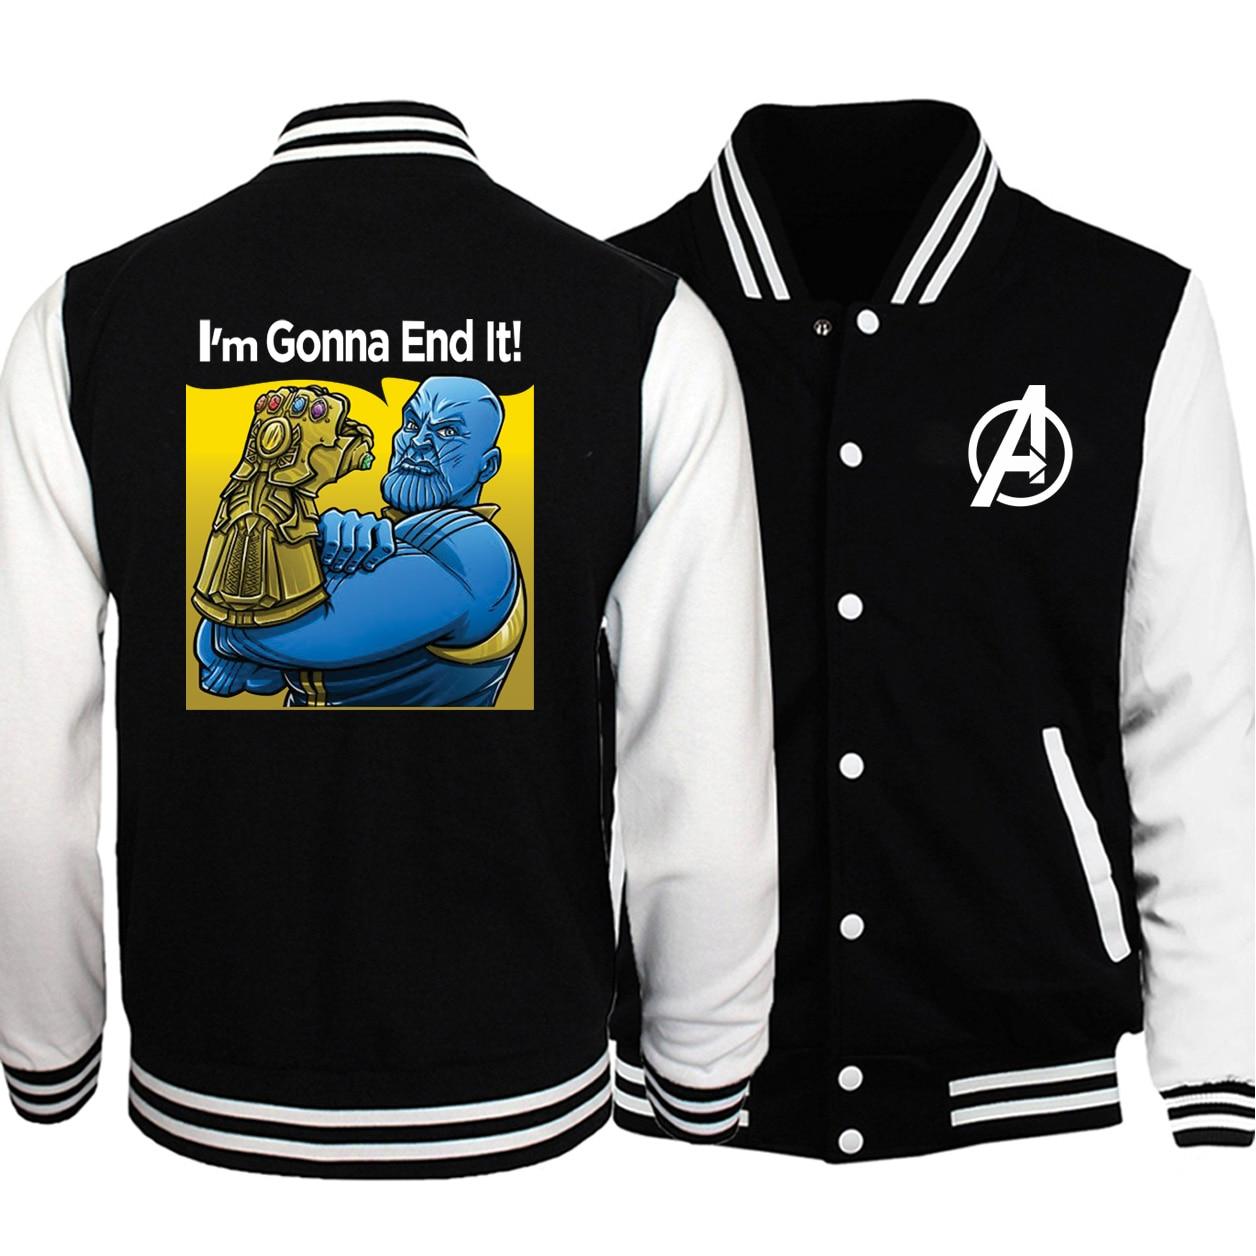 Los Vengadores Thanos Baseball hombres Im gonna end it chaquetas abrigos invierno otoño Guantelete del Infinito chaqueta Bomber de talla grande